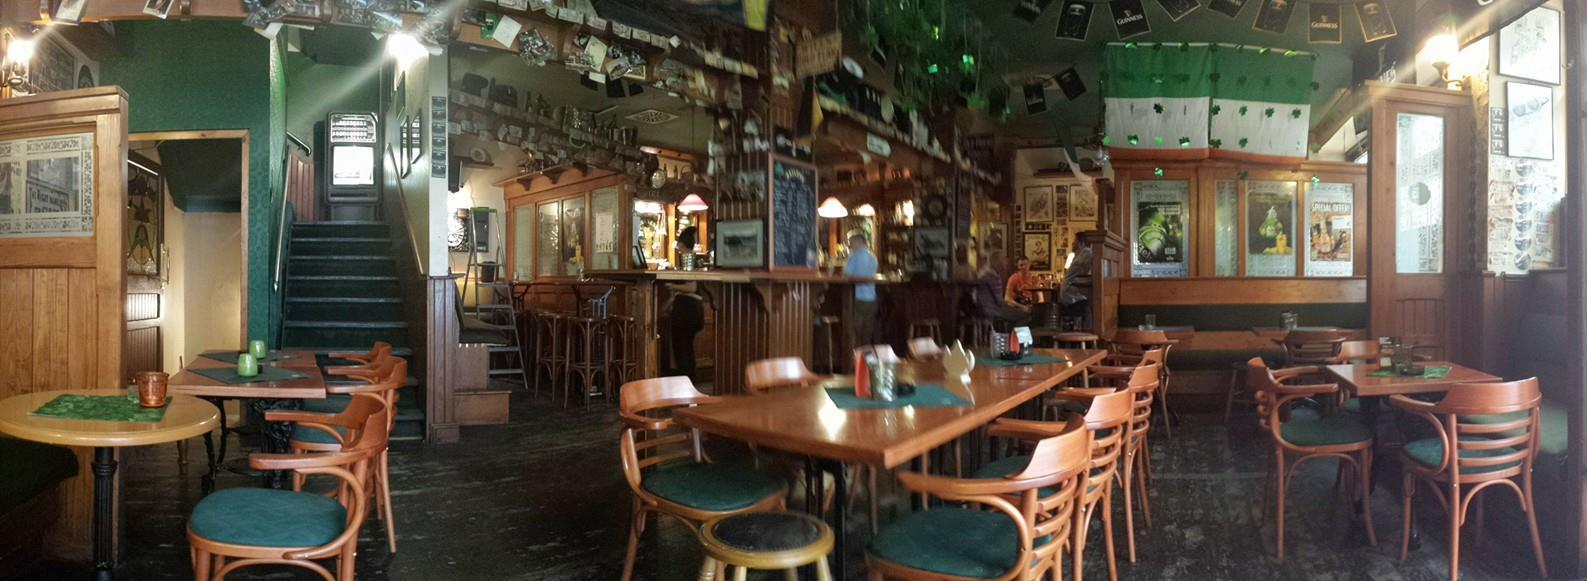 Sean O`Caseys Irish Pub in Karlsruhe - Karlsruhe Insider